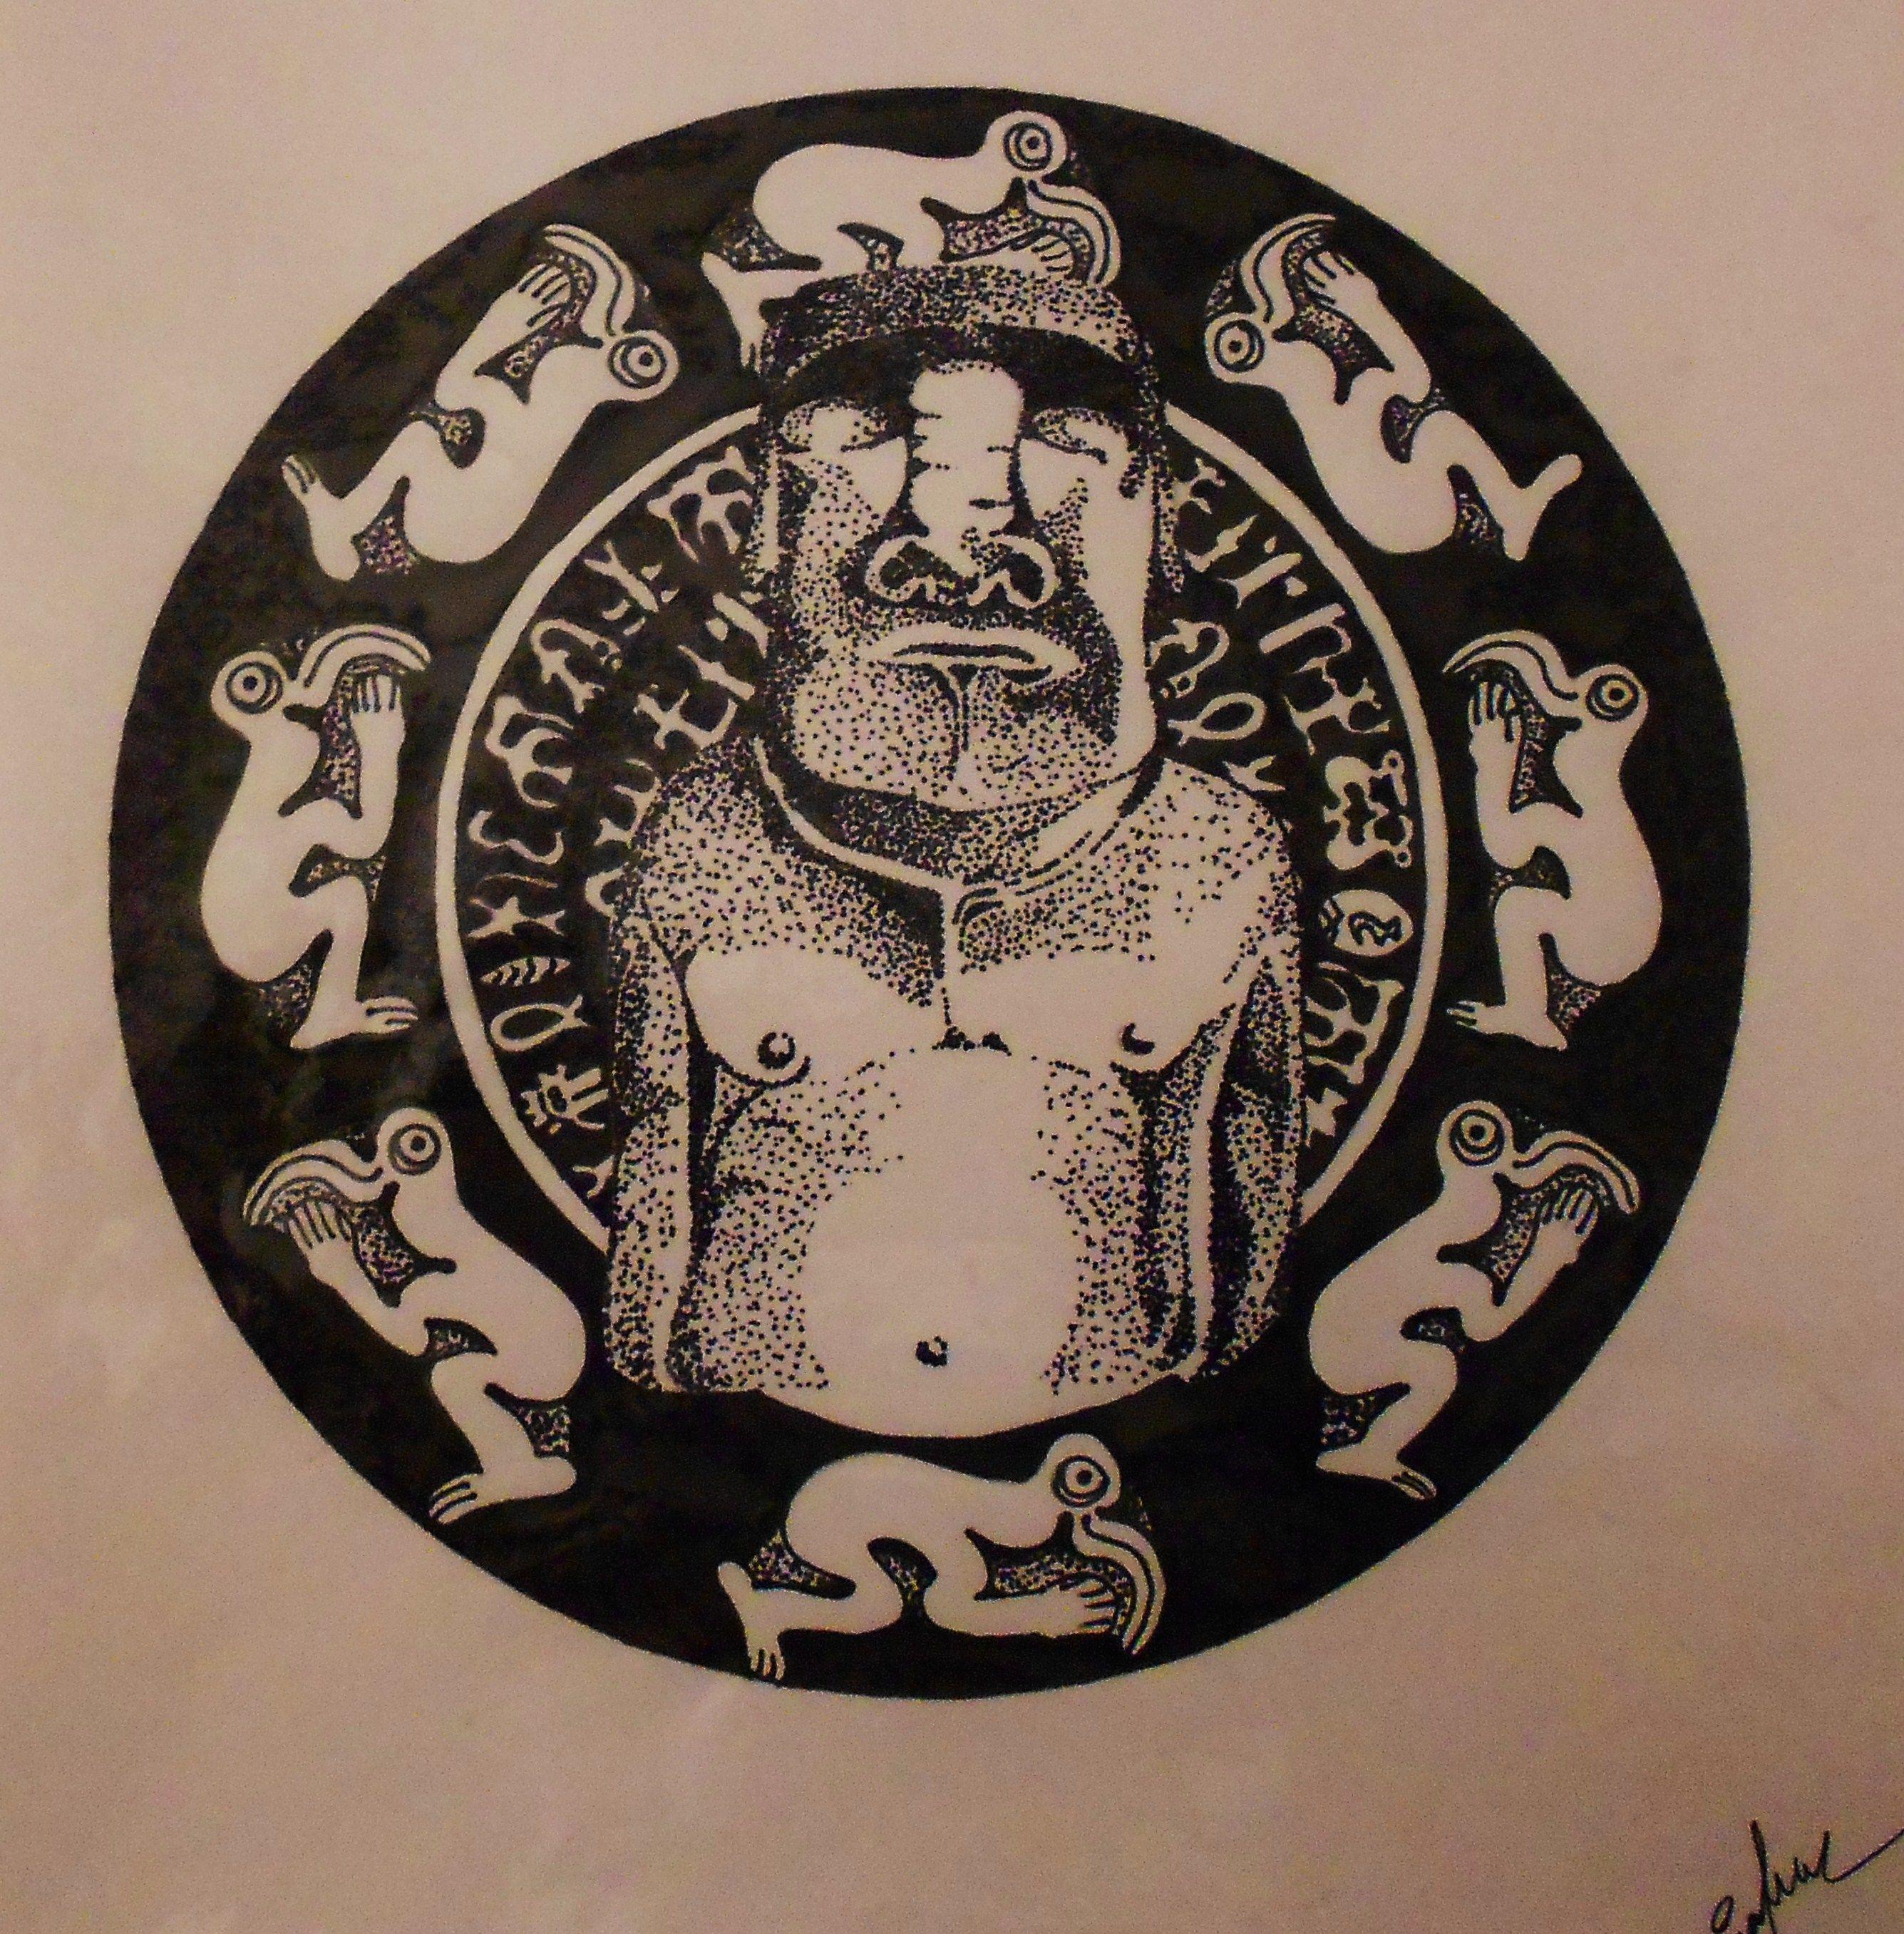 Easter island (rapanui)